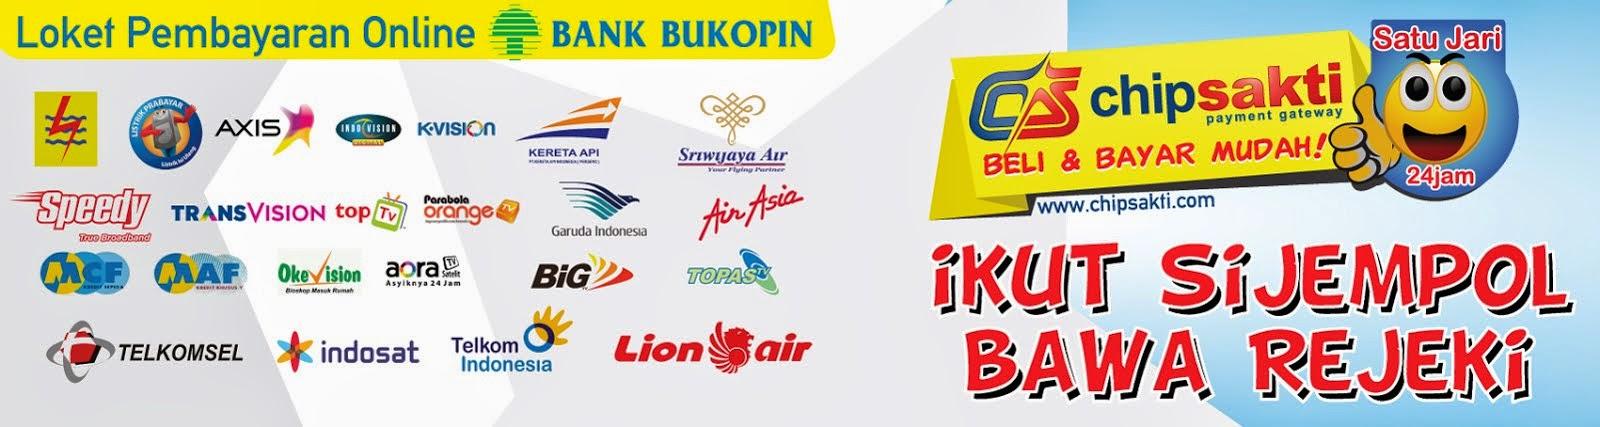 Kenaikan Tarif Kereta Api Pangrango Bogor-Sukabumi